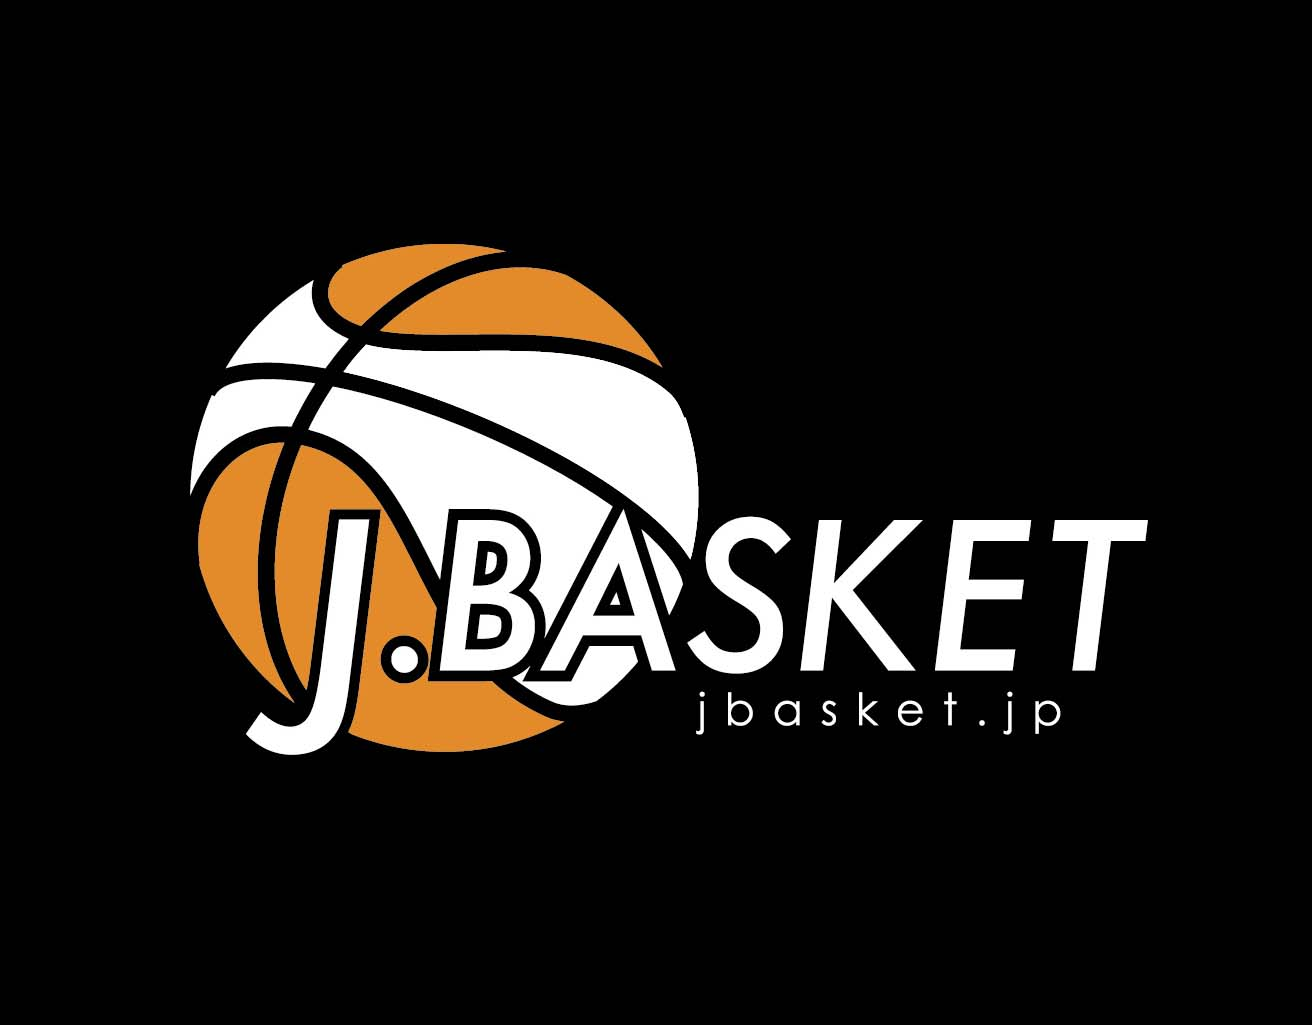 J basket